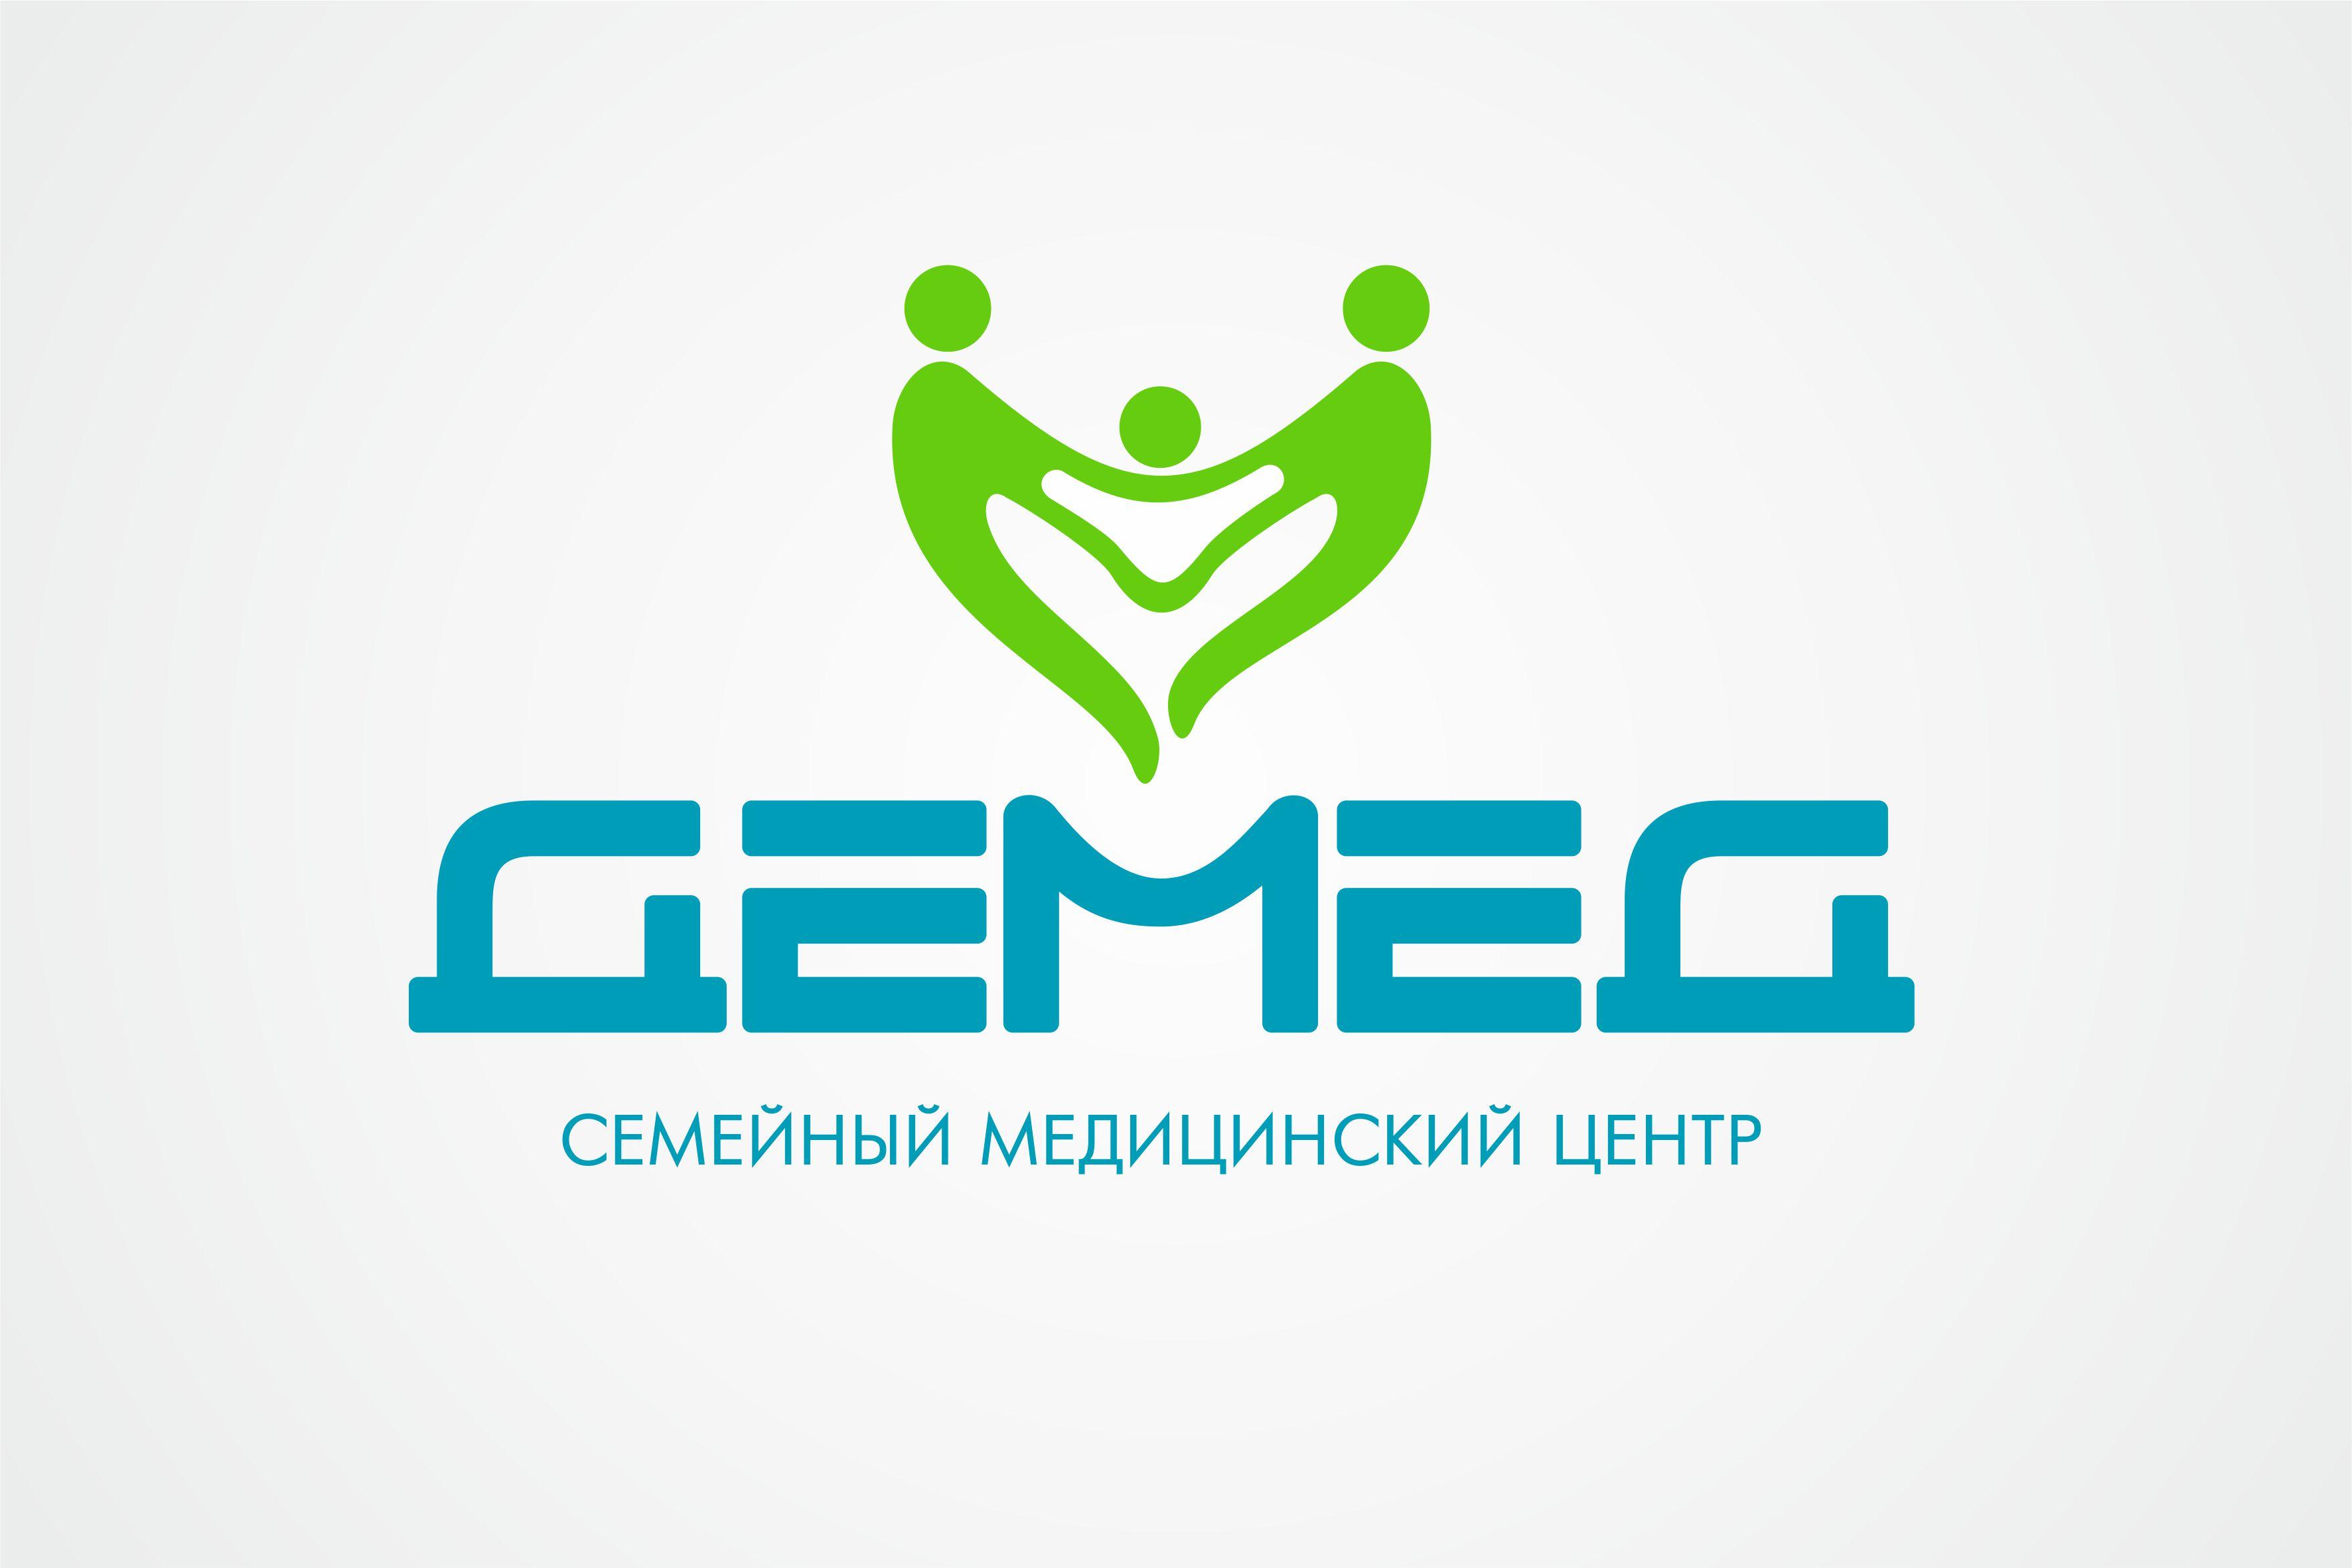 Логотип медицинского центра фото f_9405dcd267e39958.jpg